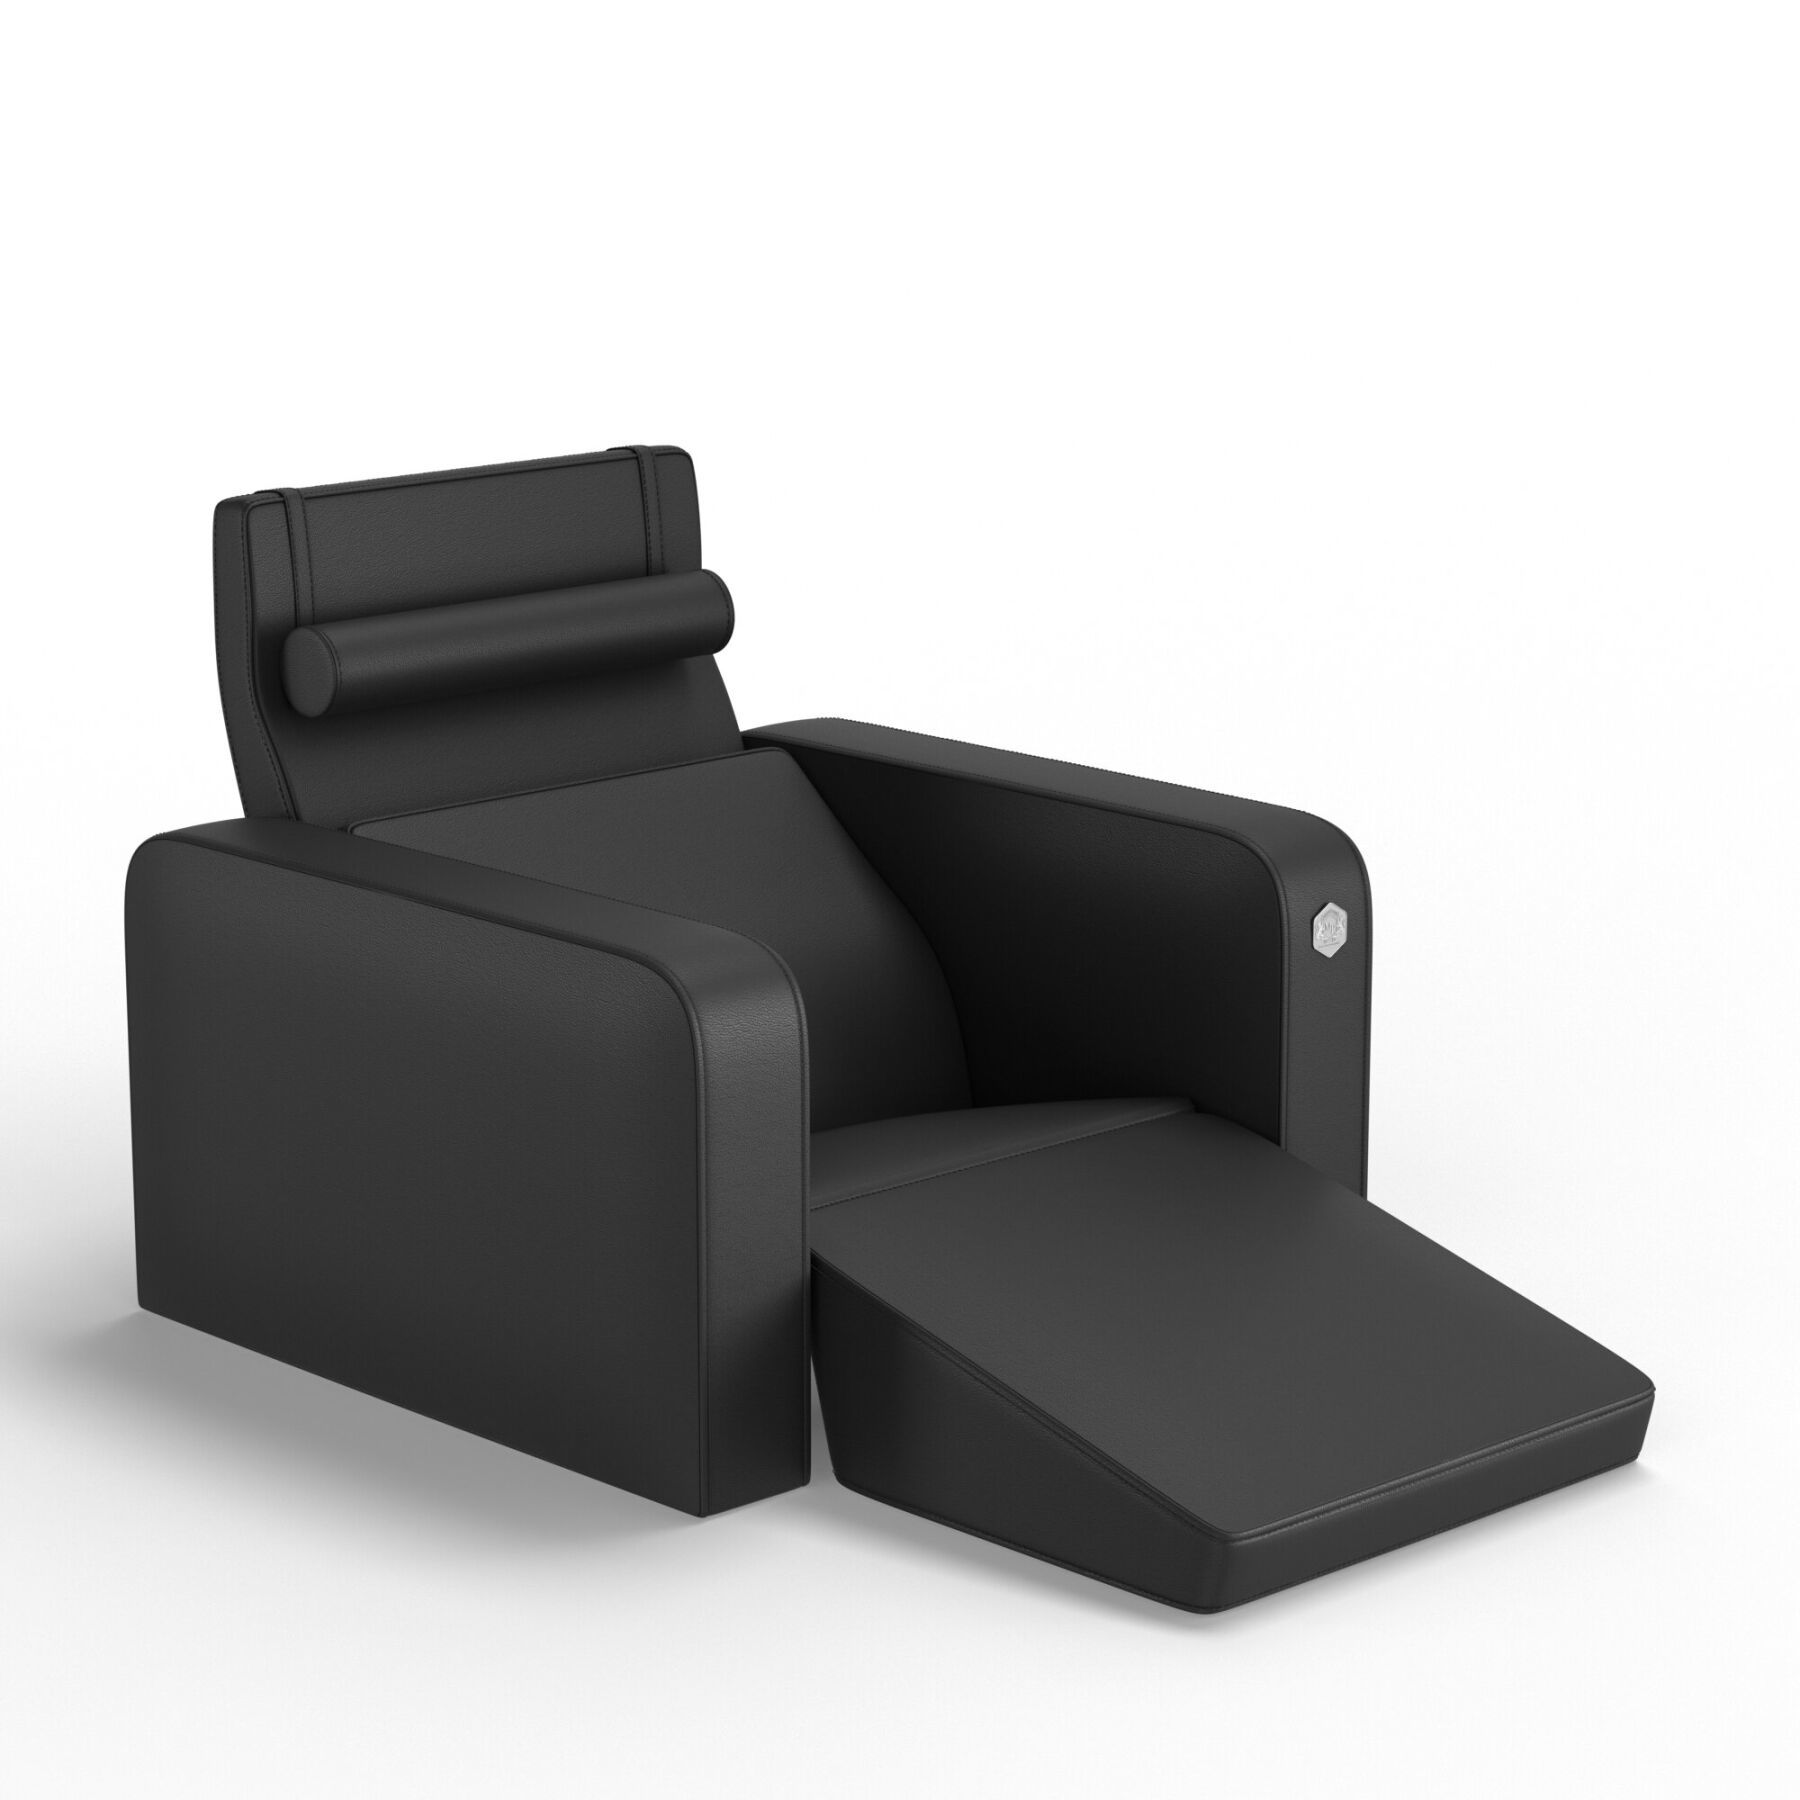 Мягкое кресло KULIK SYSTEM PLEASURE Кожа Целый